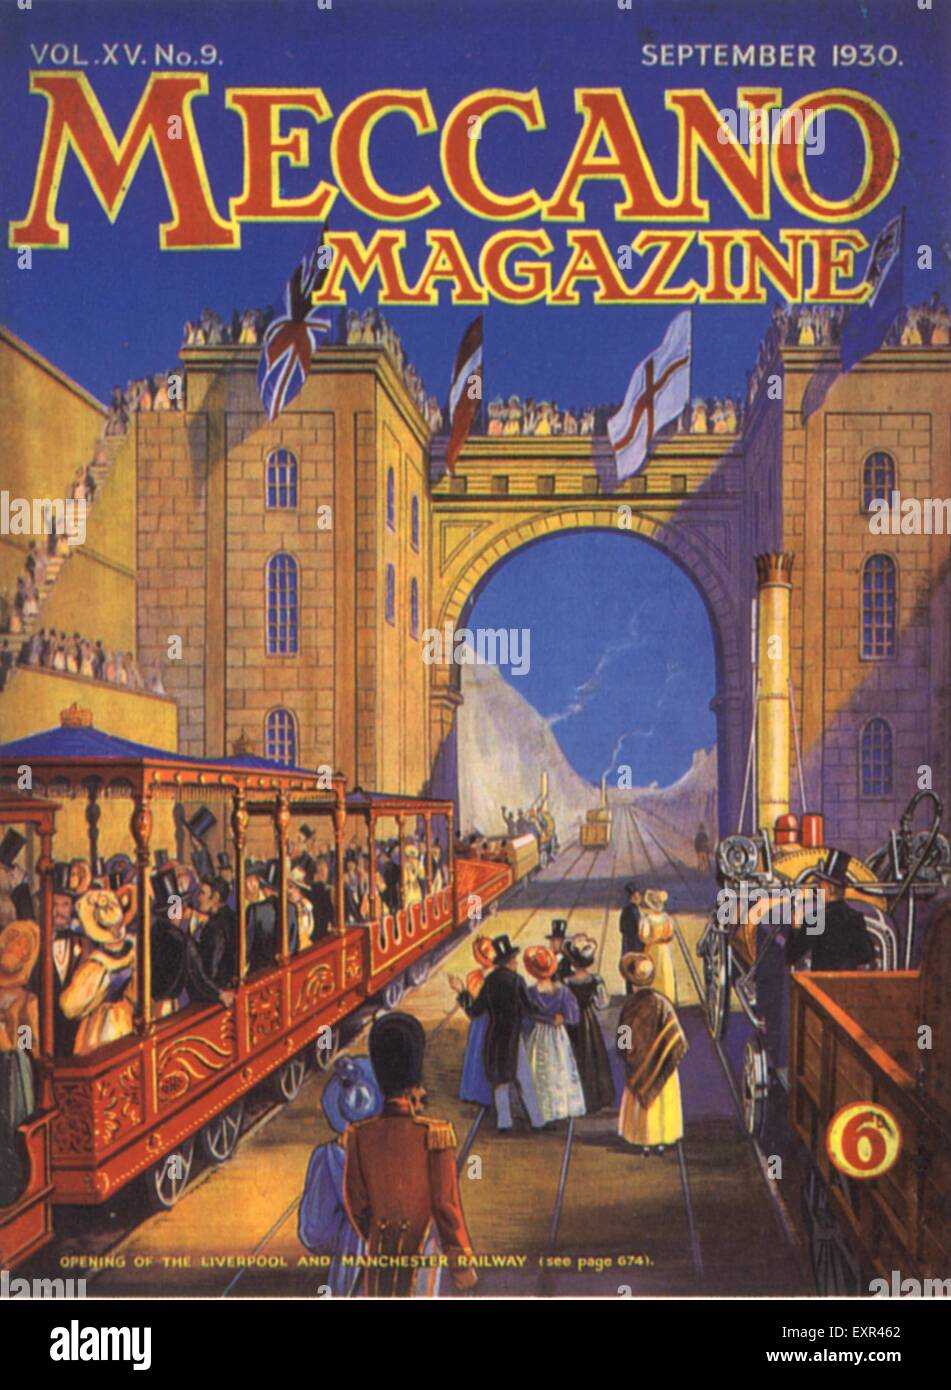 1930s UK Meccano Magazine Advert - Stock Image